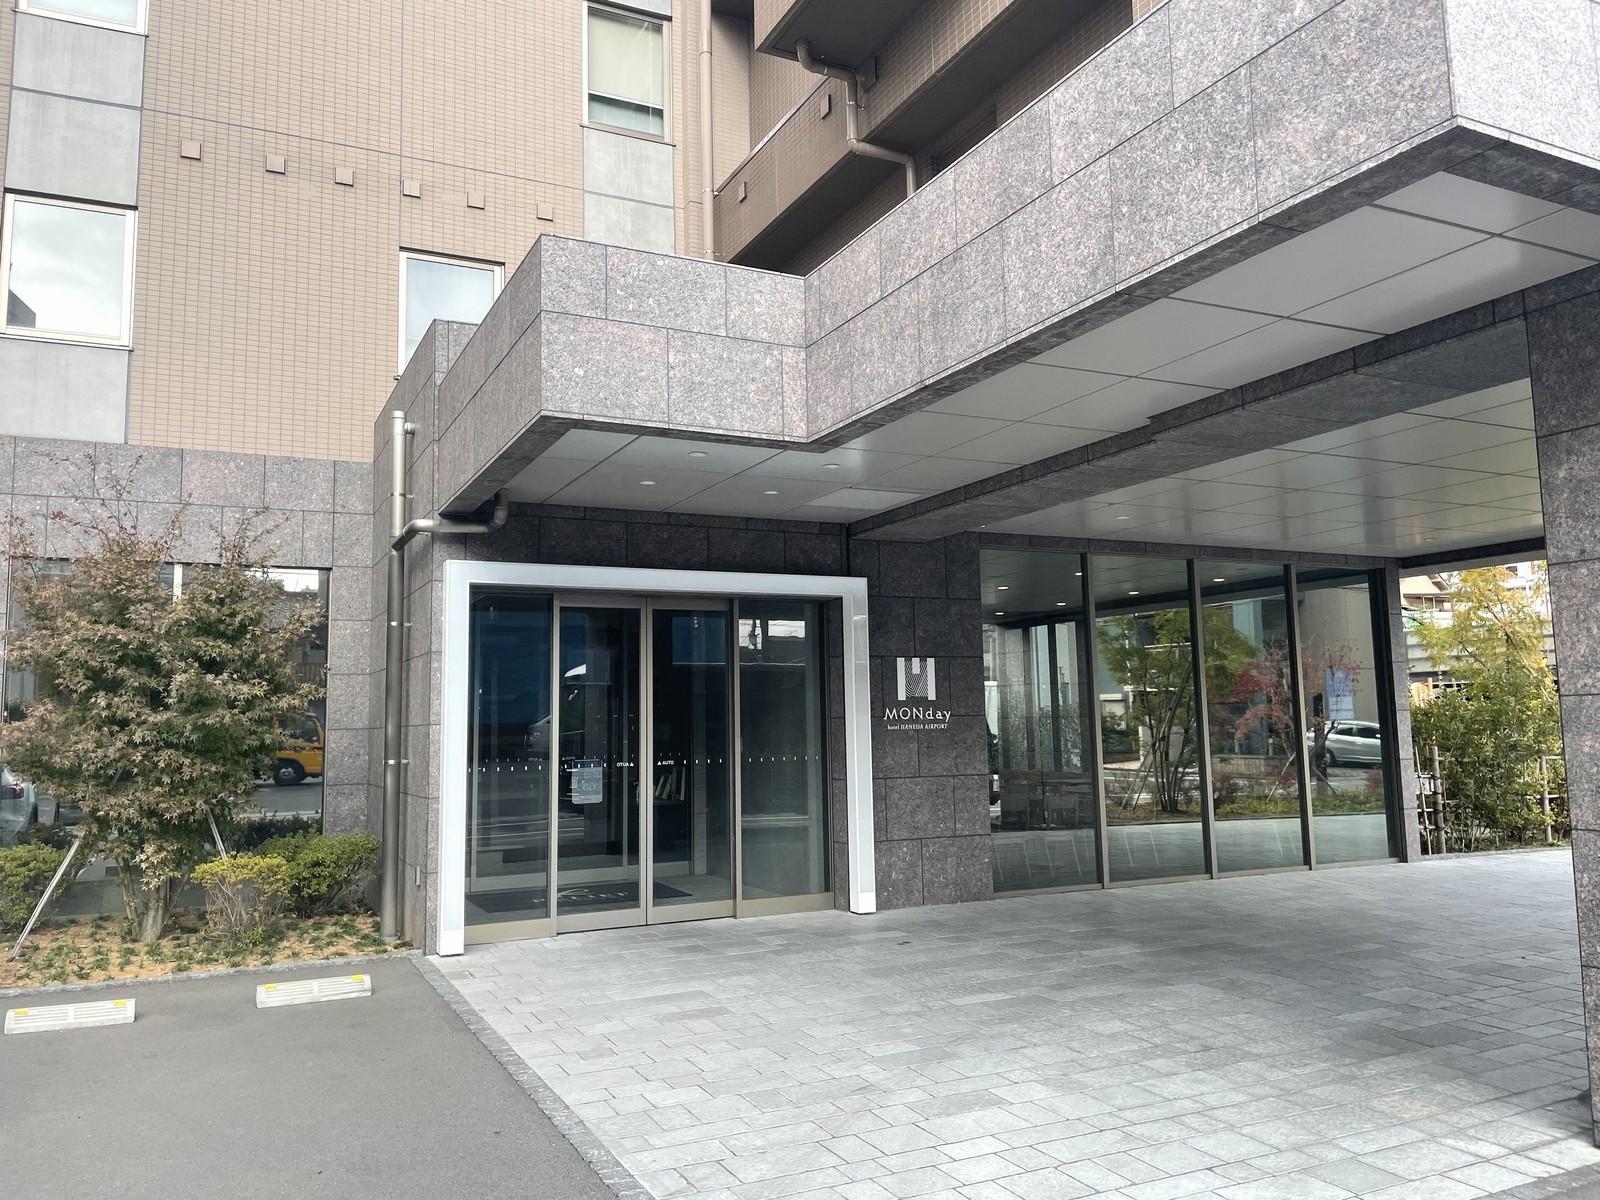 hotel MONday 羽田空港 【スタンダードプラン】大鳥居駅から徒歩2分/羽田空港まで約10分♪<期間限定!無料朝食BOX付>